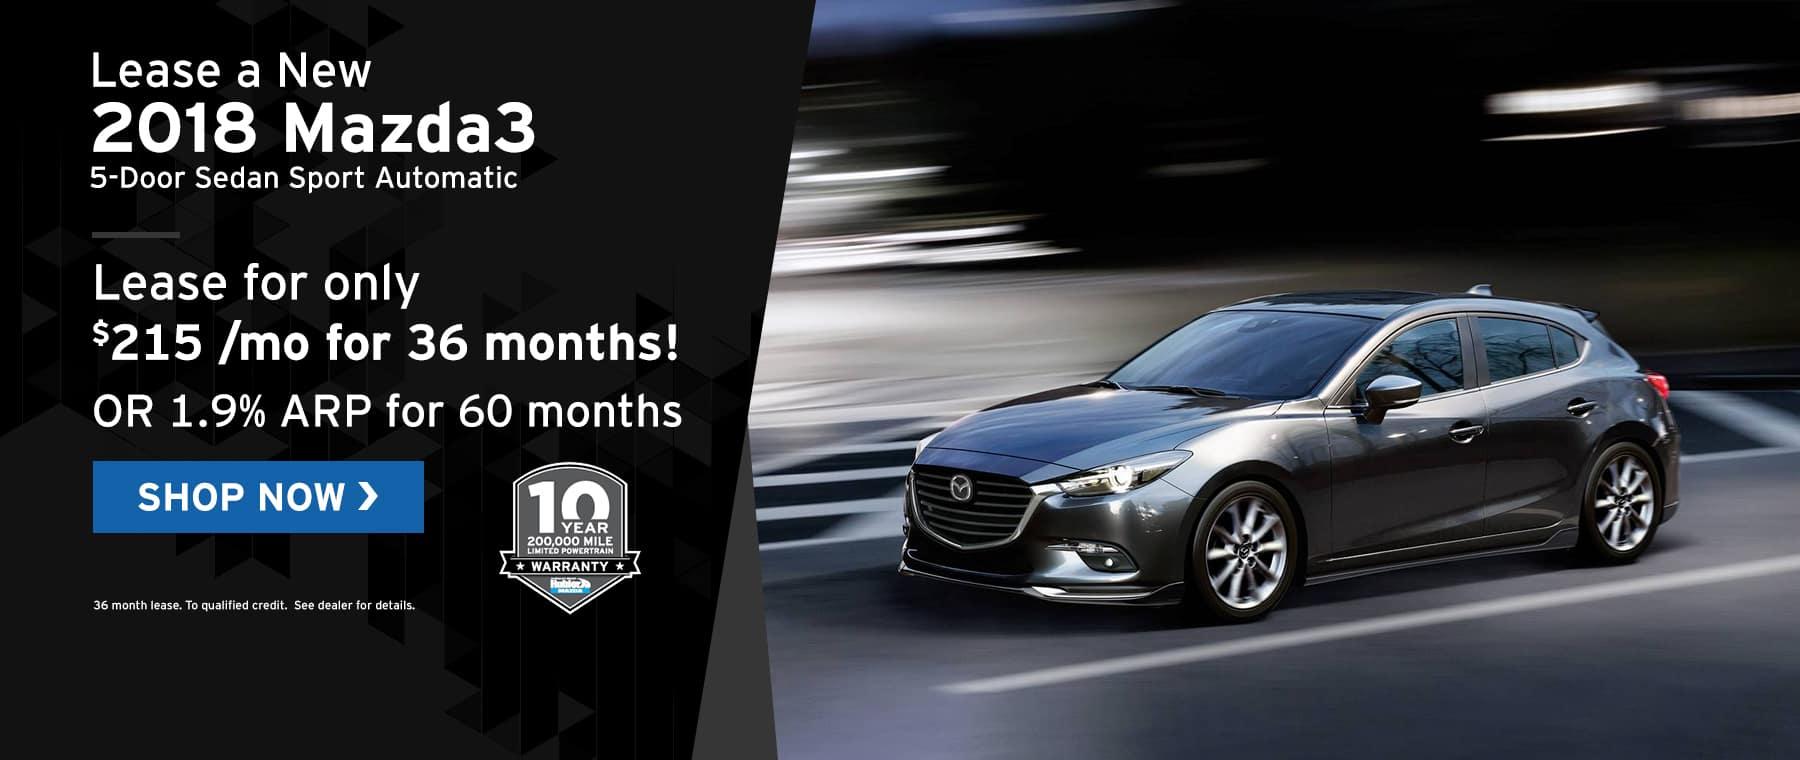 Mazda3 specials at Hubler Mazda